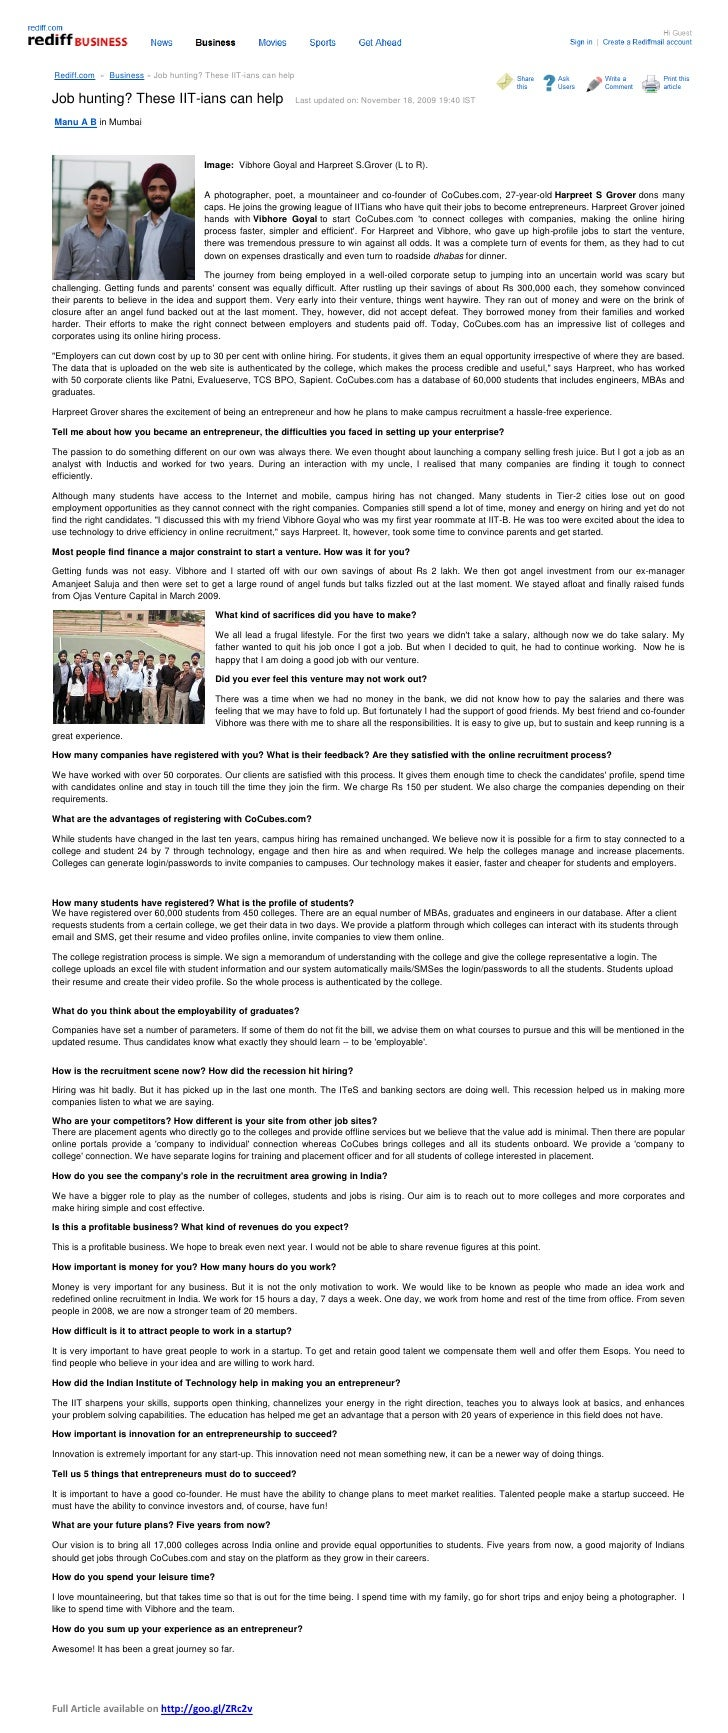 Rediff.com » Business » Job hunting? These IIT-ians can helpJob hunting? These IIT-ians can help                          ...